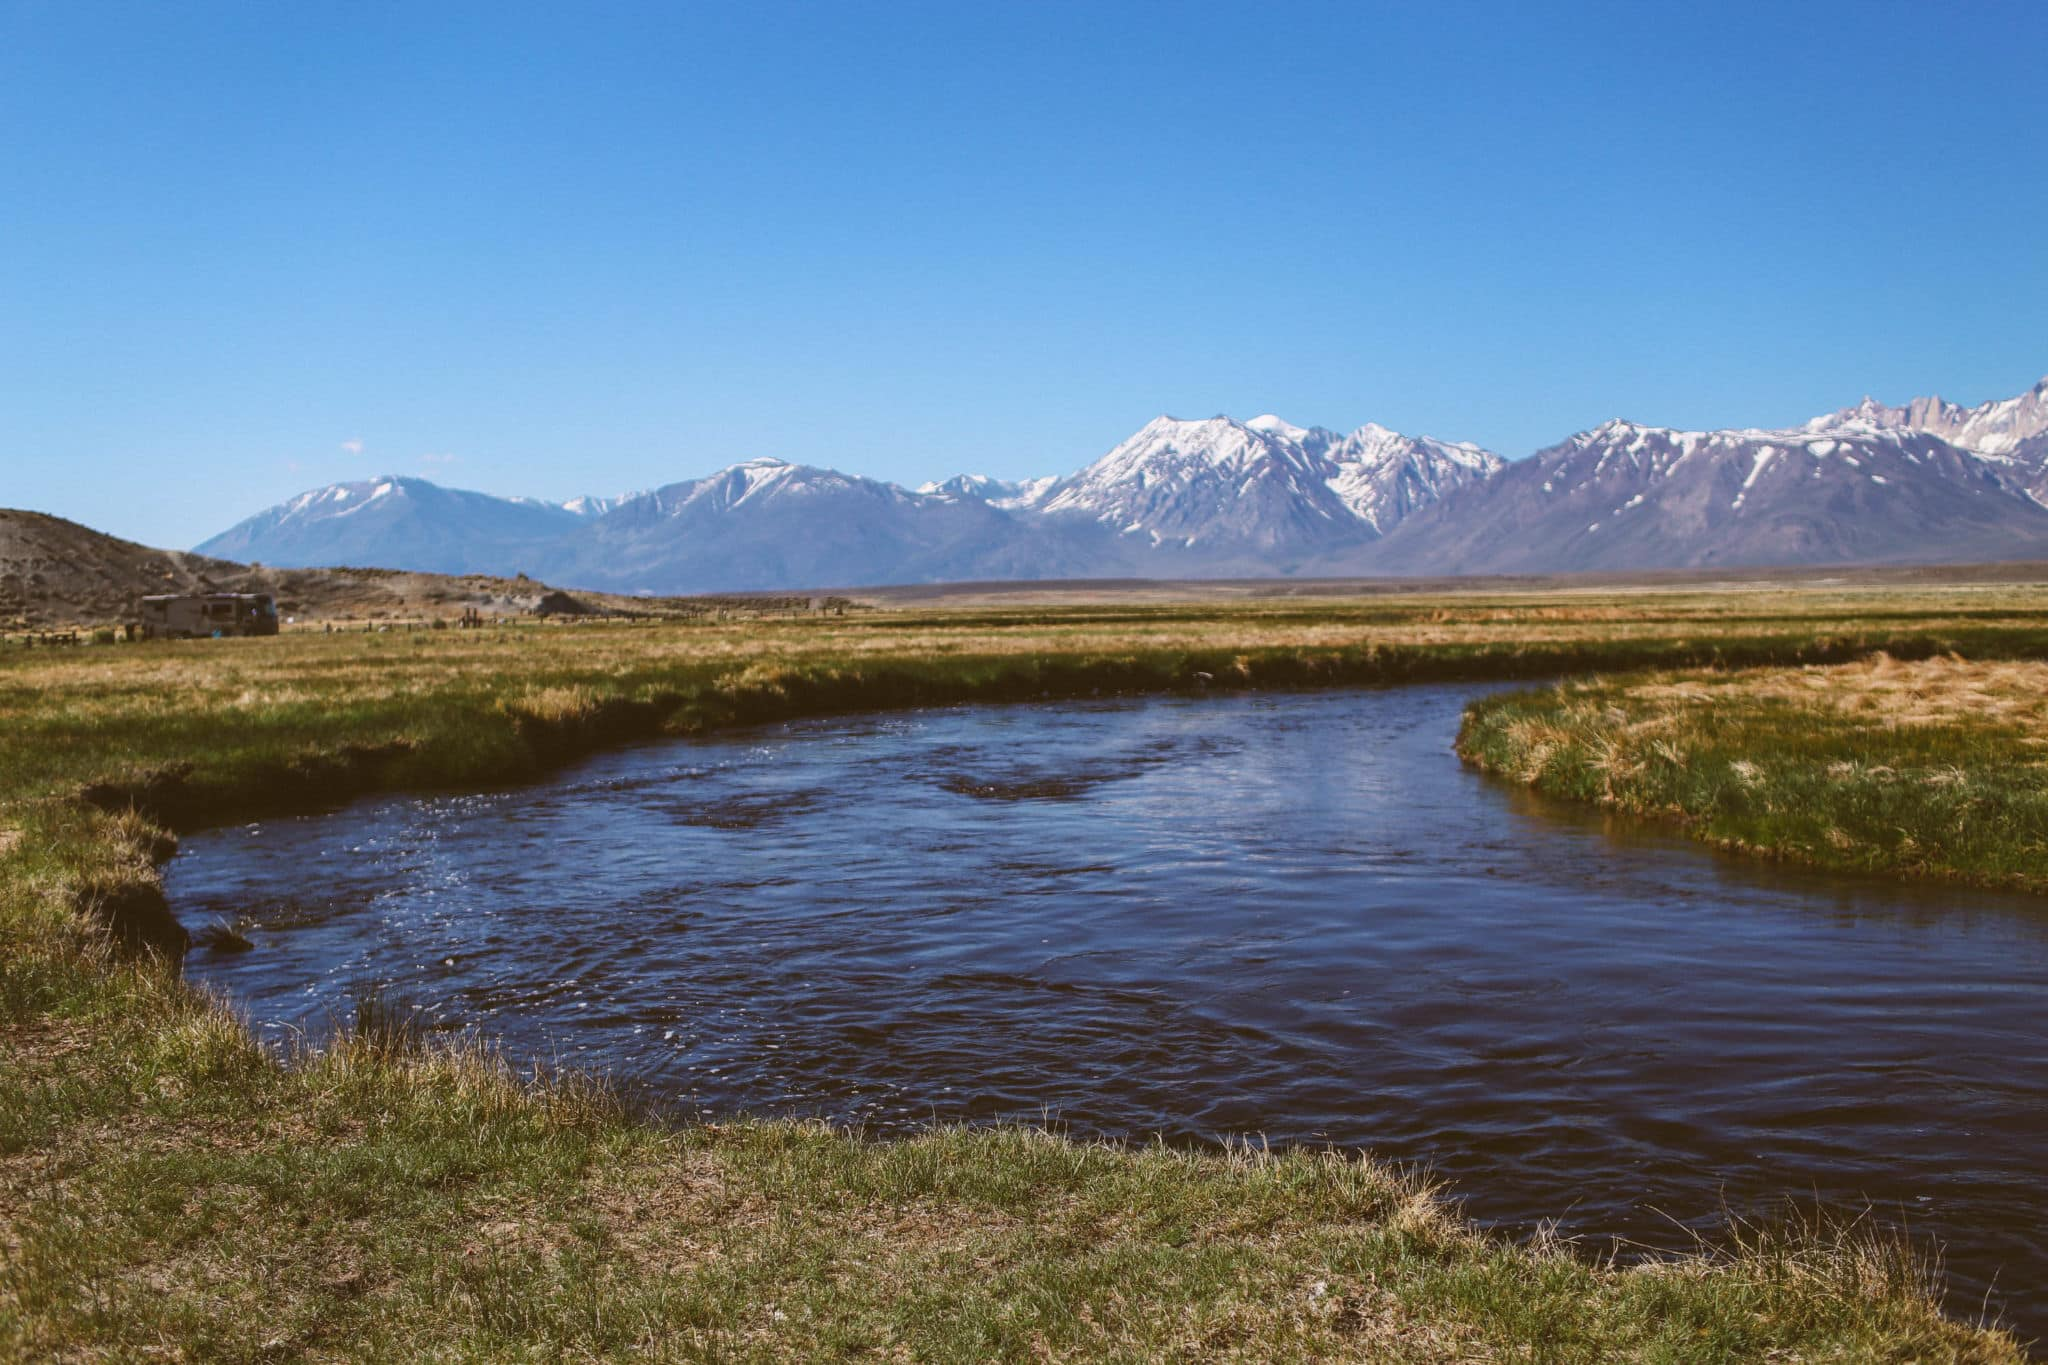 Owen's river running through the mountains